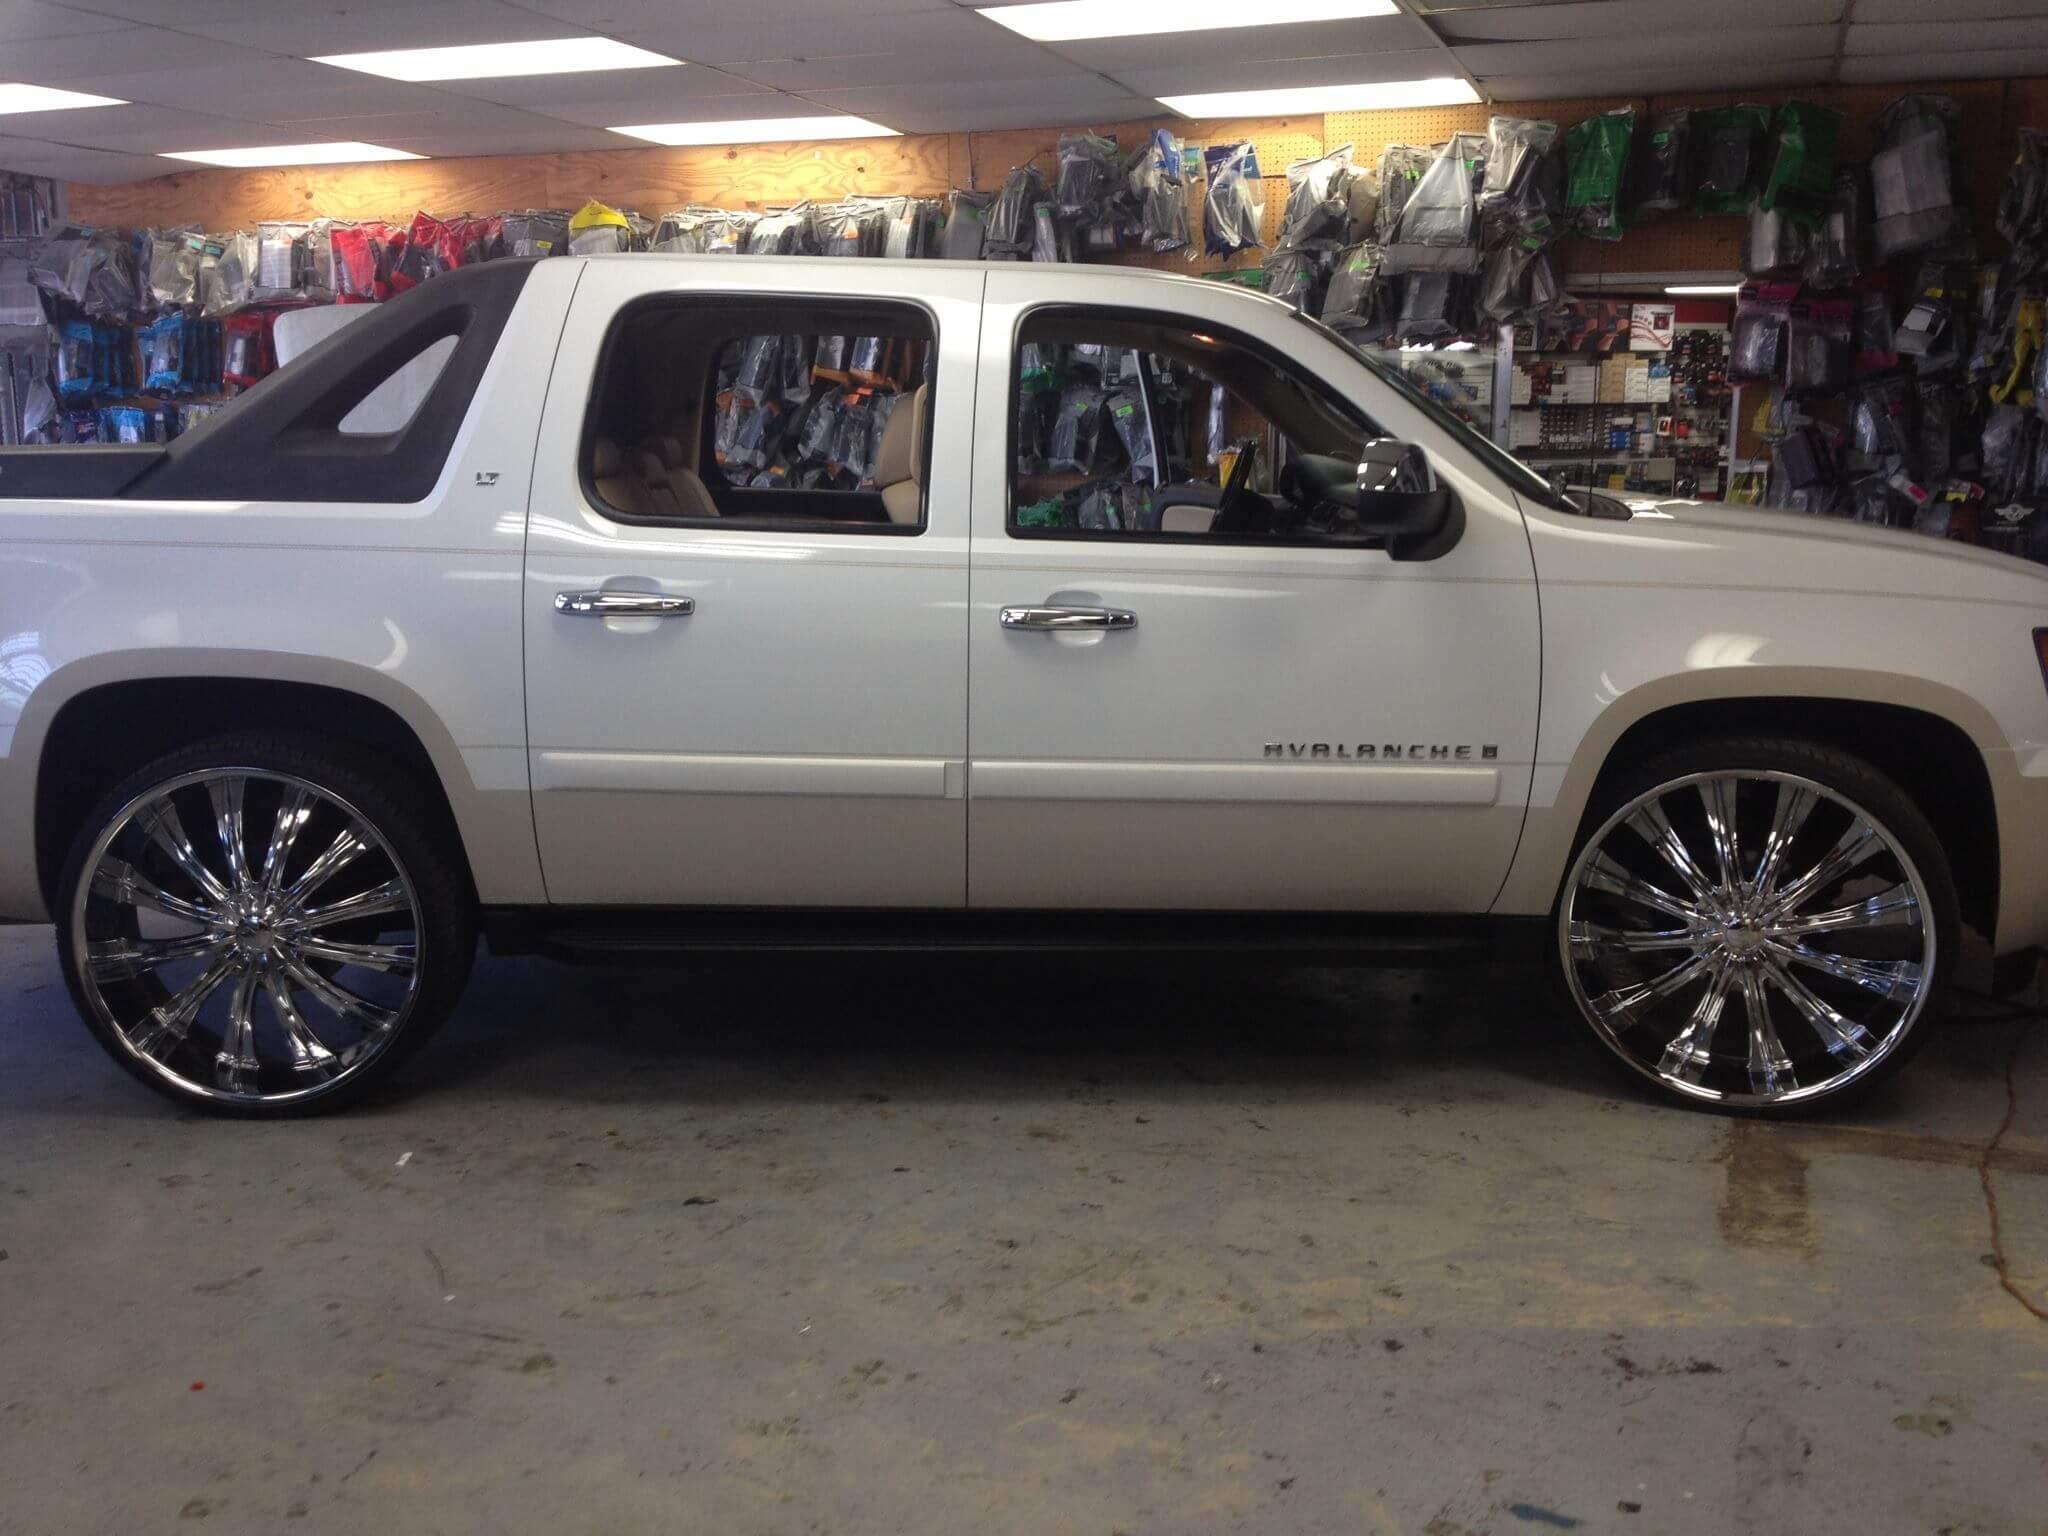 Best Car Rims and New Wheels in San Diego & El Cajon